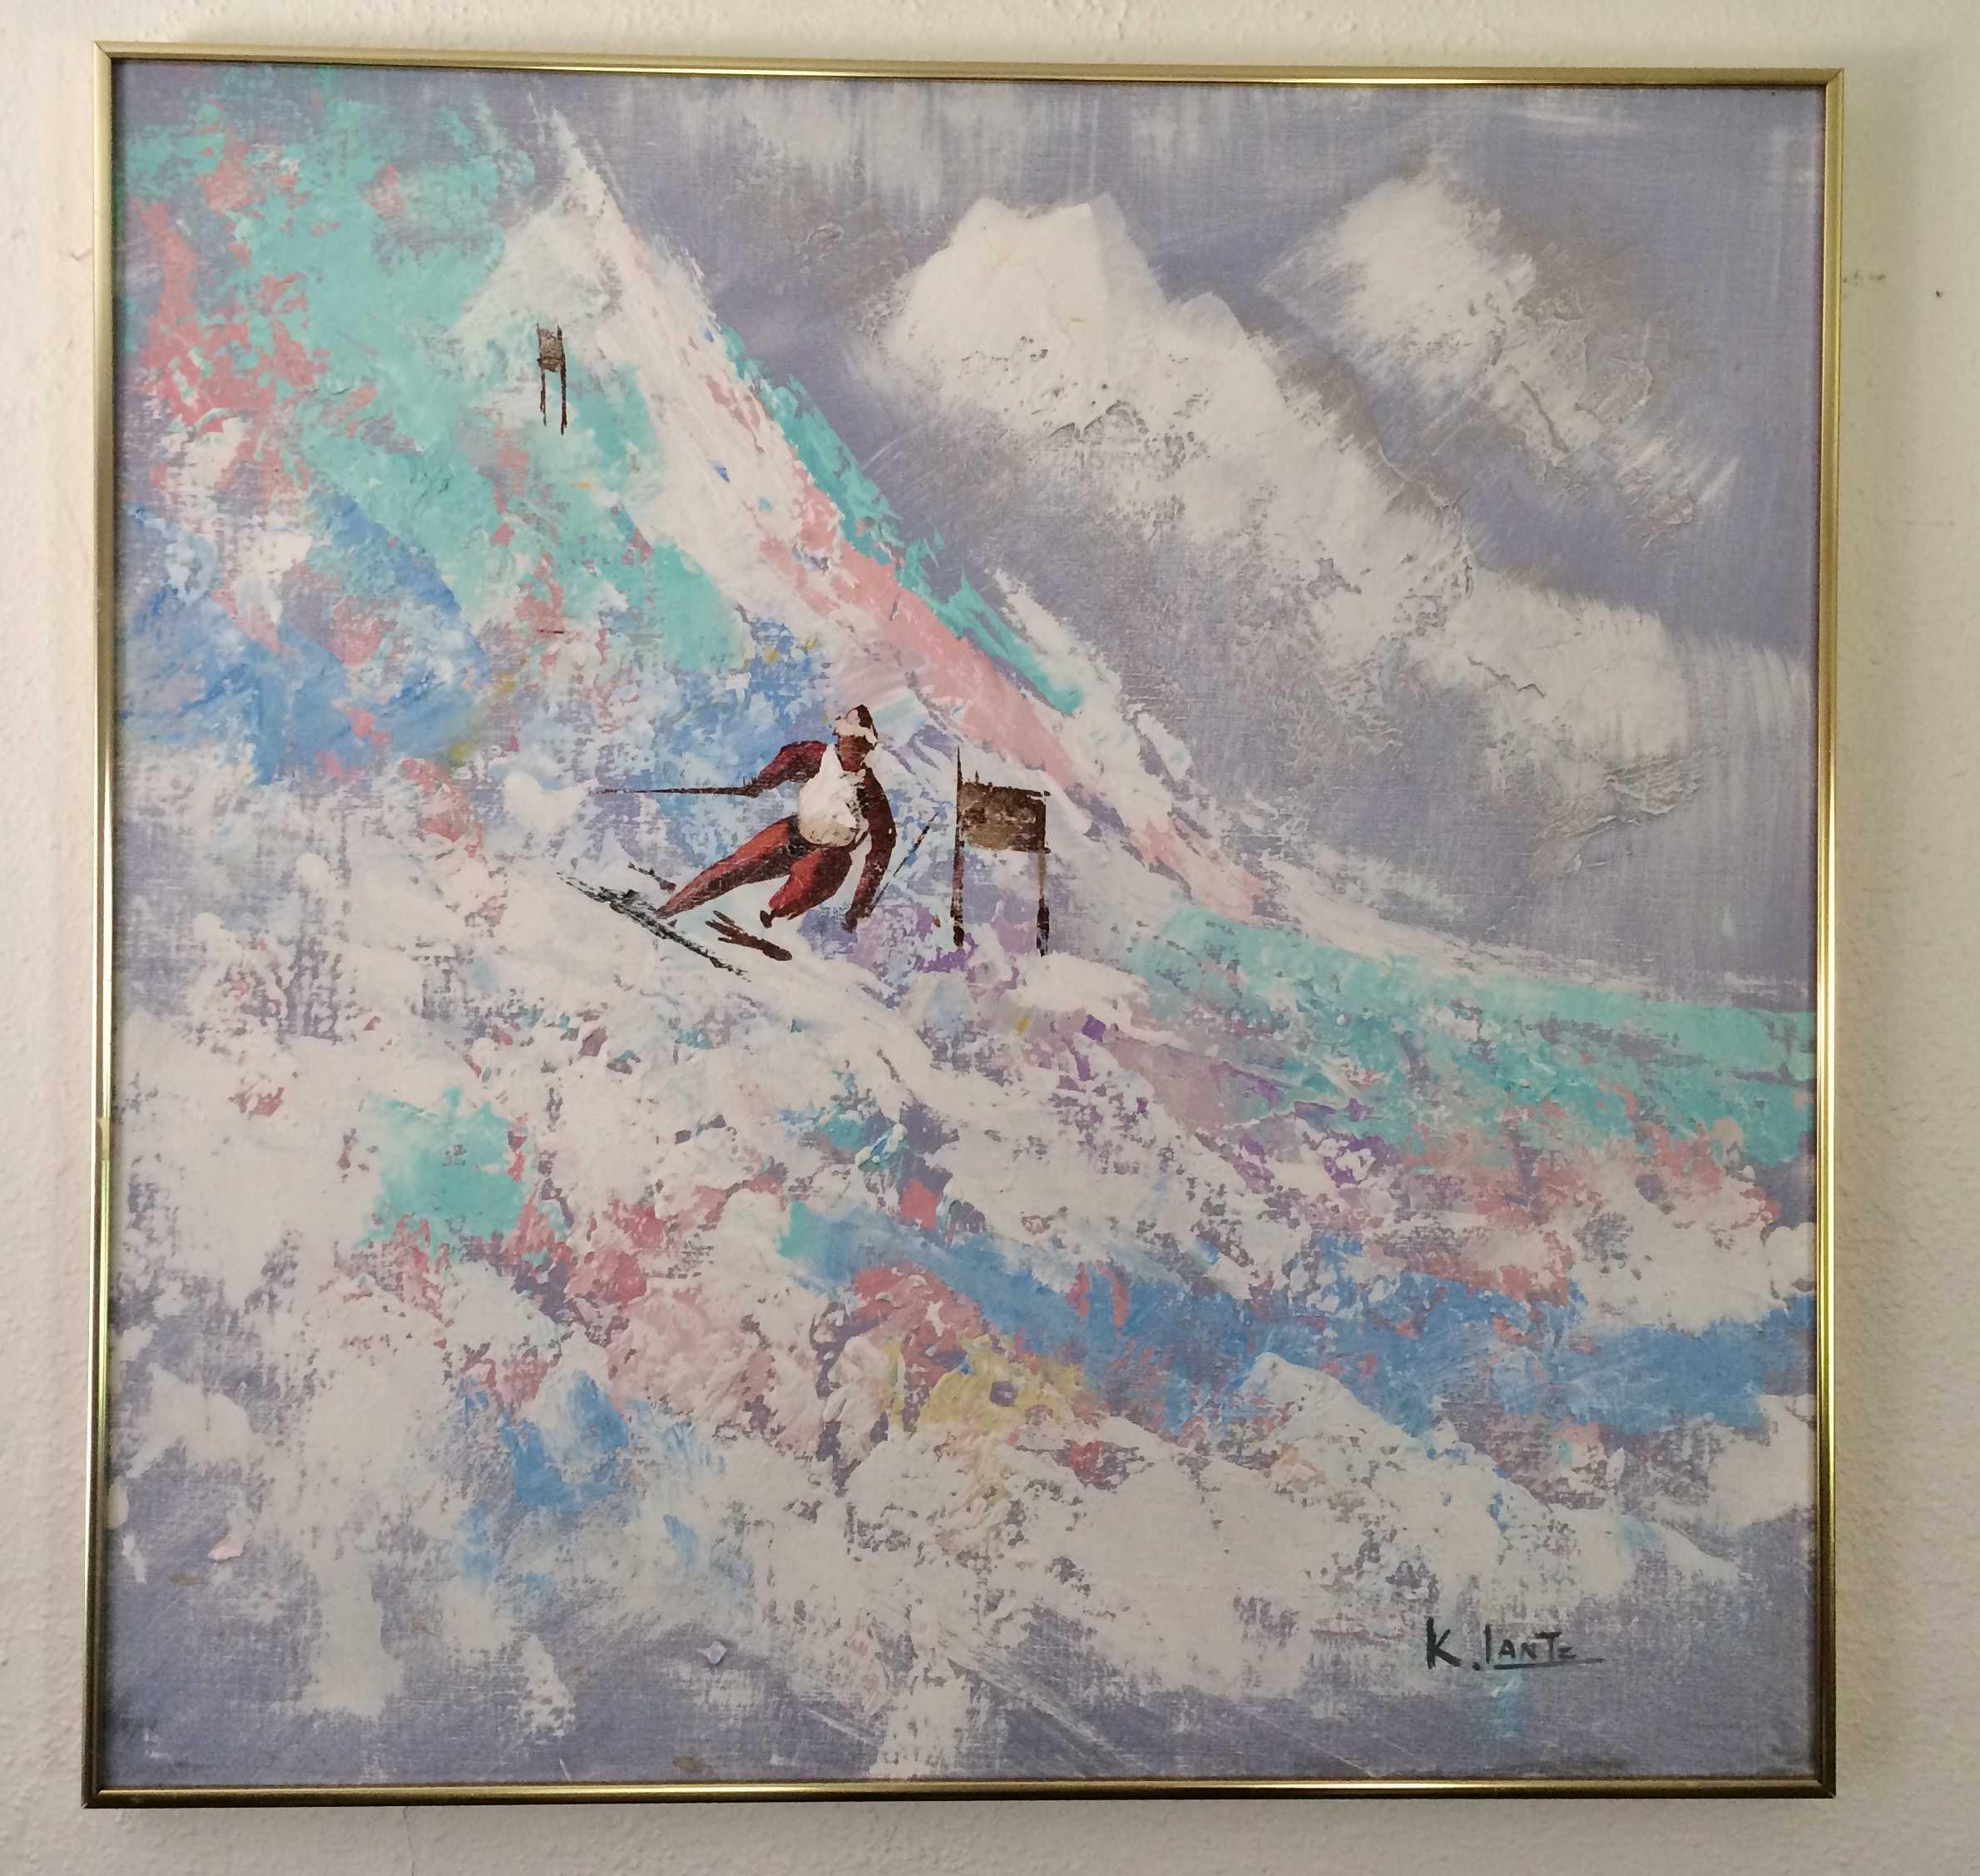 K Lantz Framed Original Signed Oil Painting Lot 224